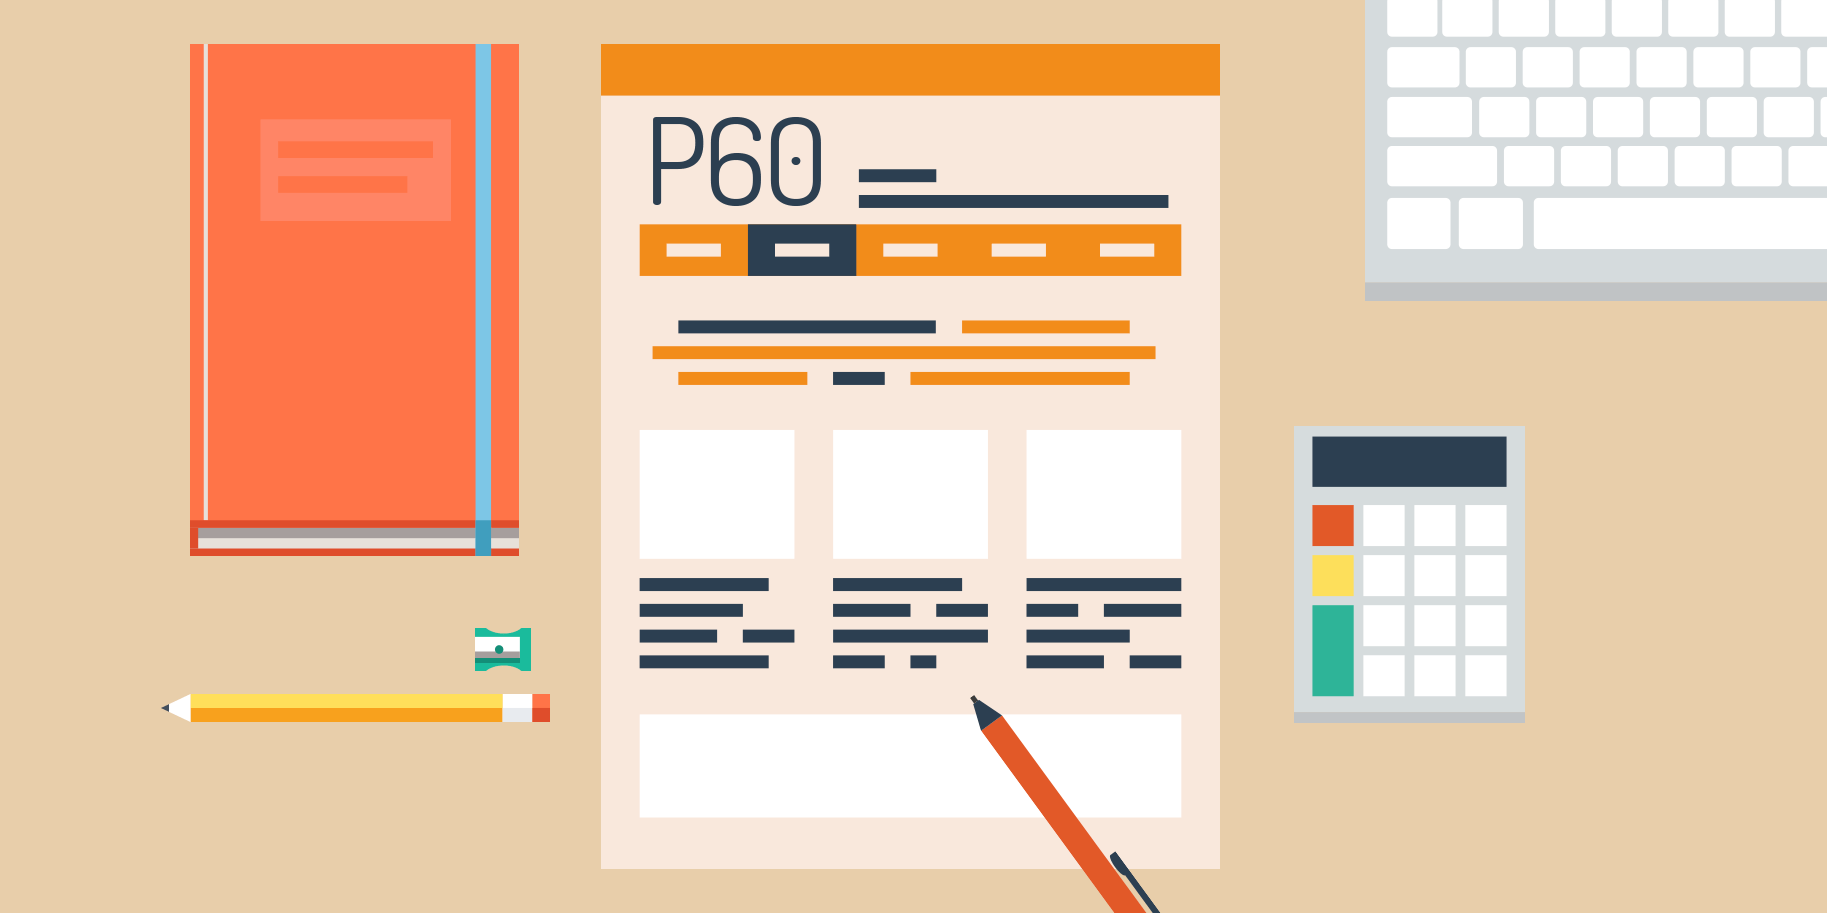 P60 on desk